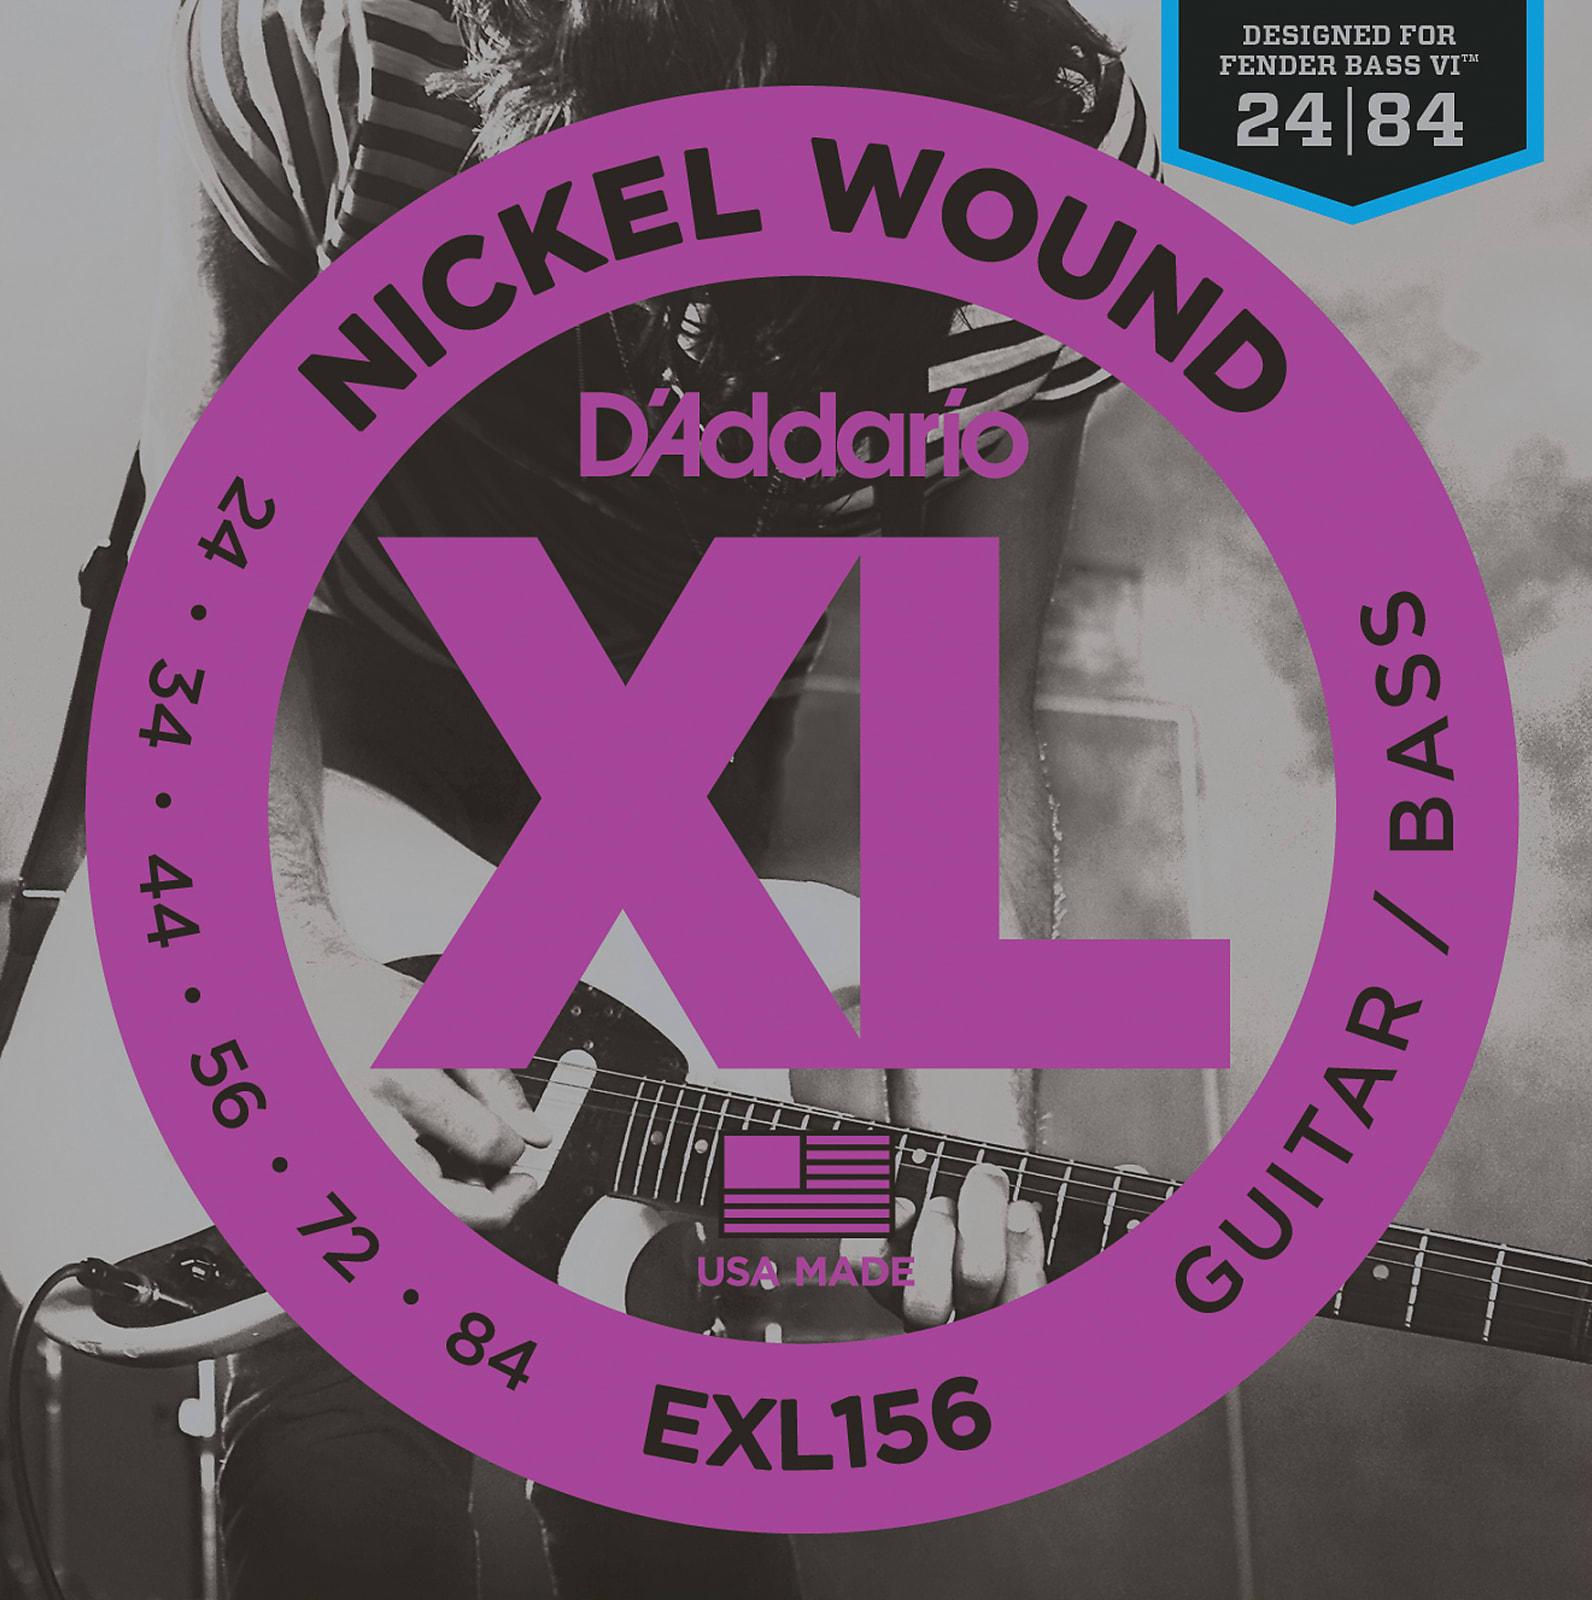 D'Addario EXL156 Nickel Wound Electric Guitar/Nickel Wound Bass Strings, Fender